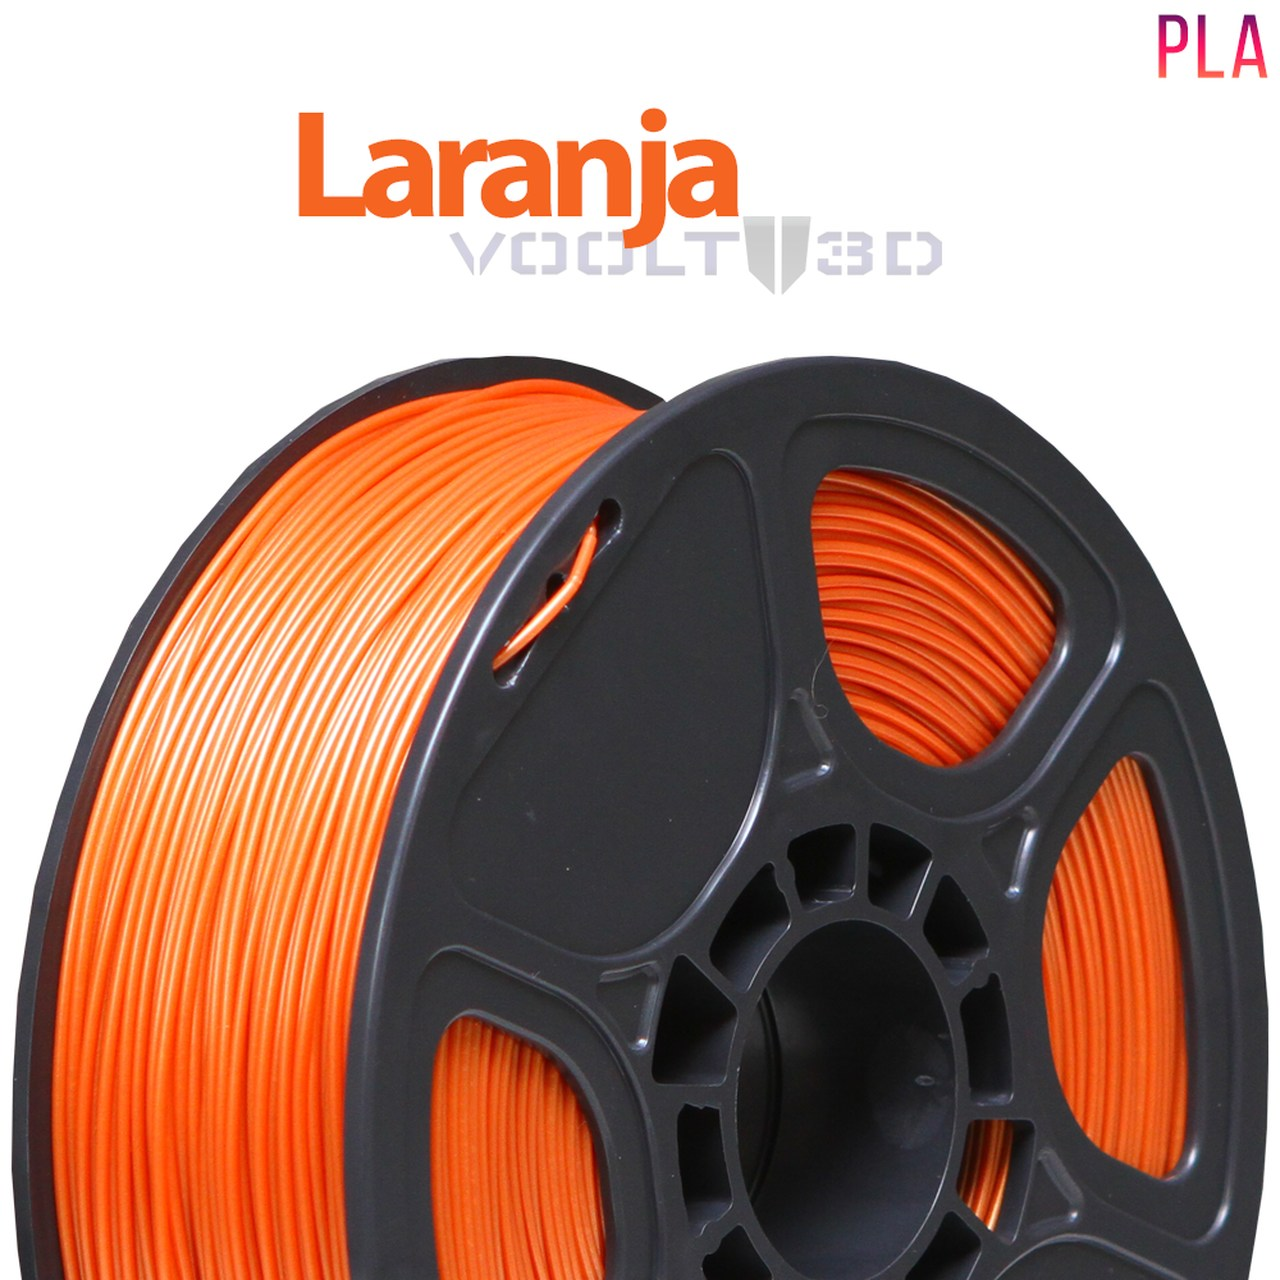 Filamento PLA - Laranja - Voolt - 1.75mm - 1kg